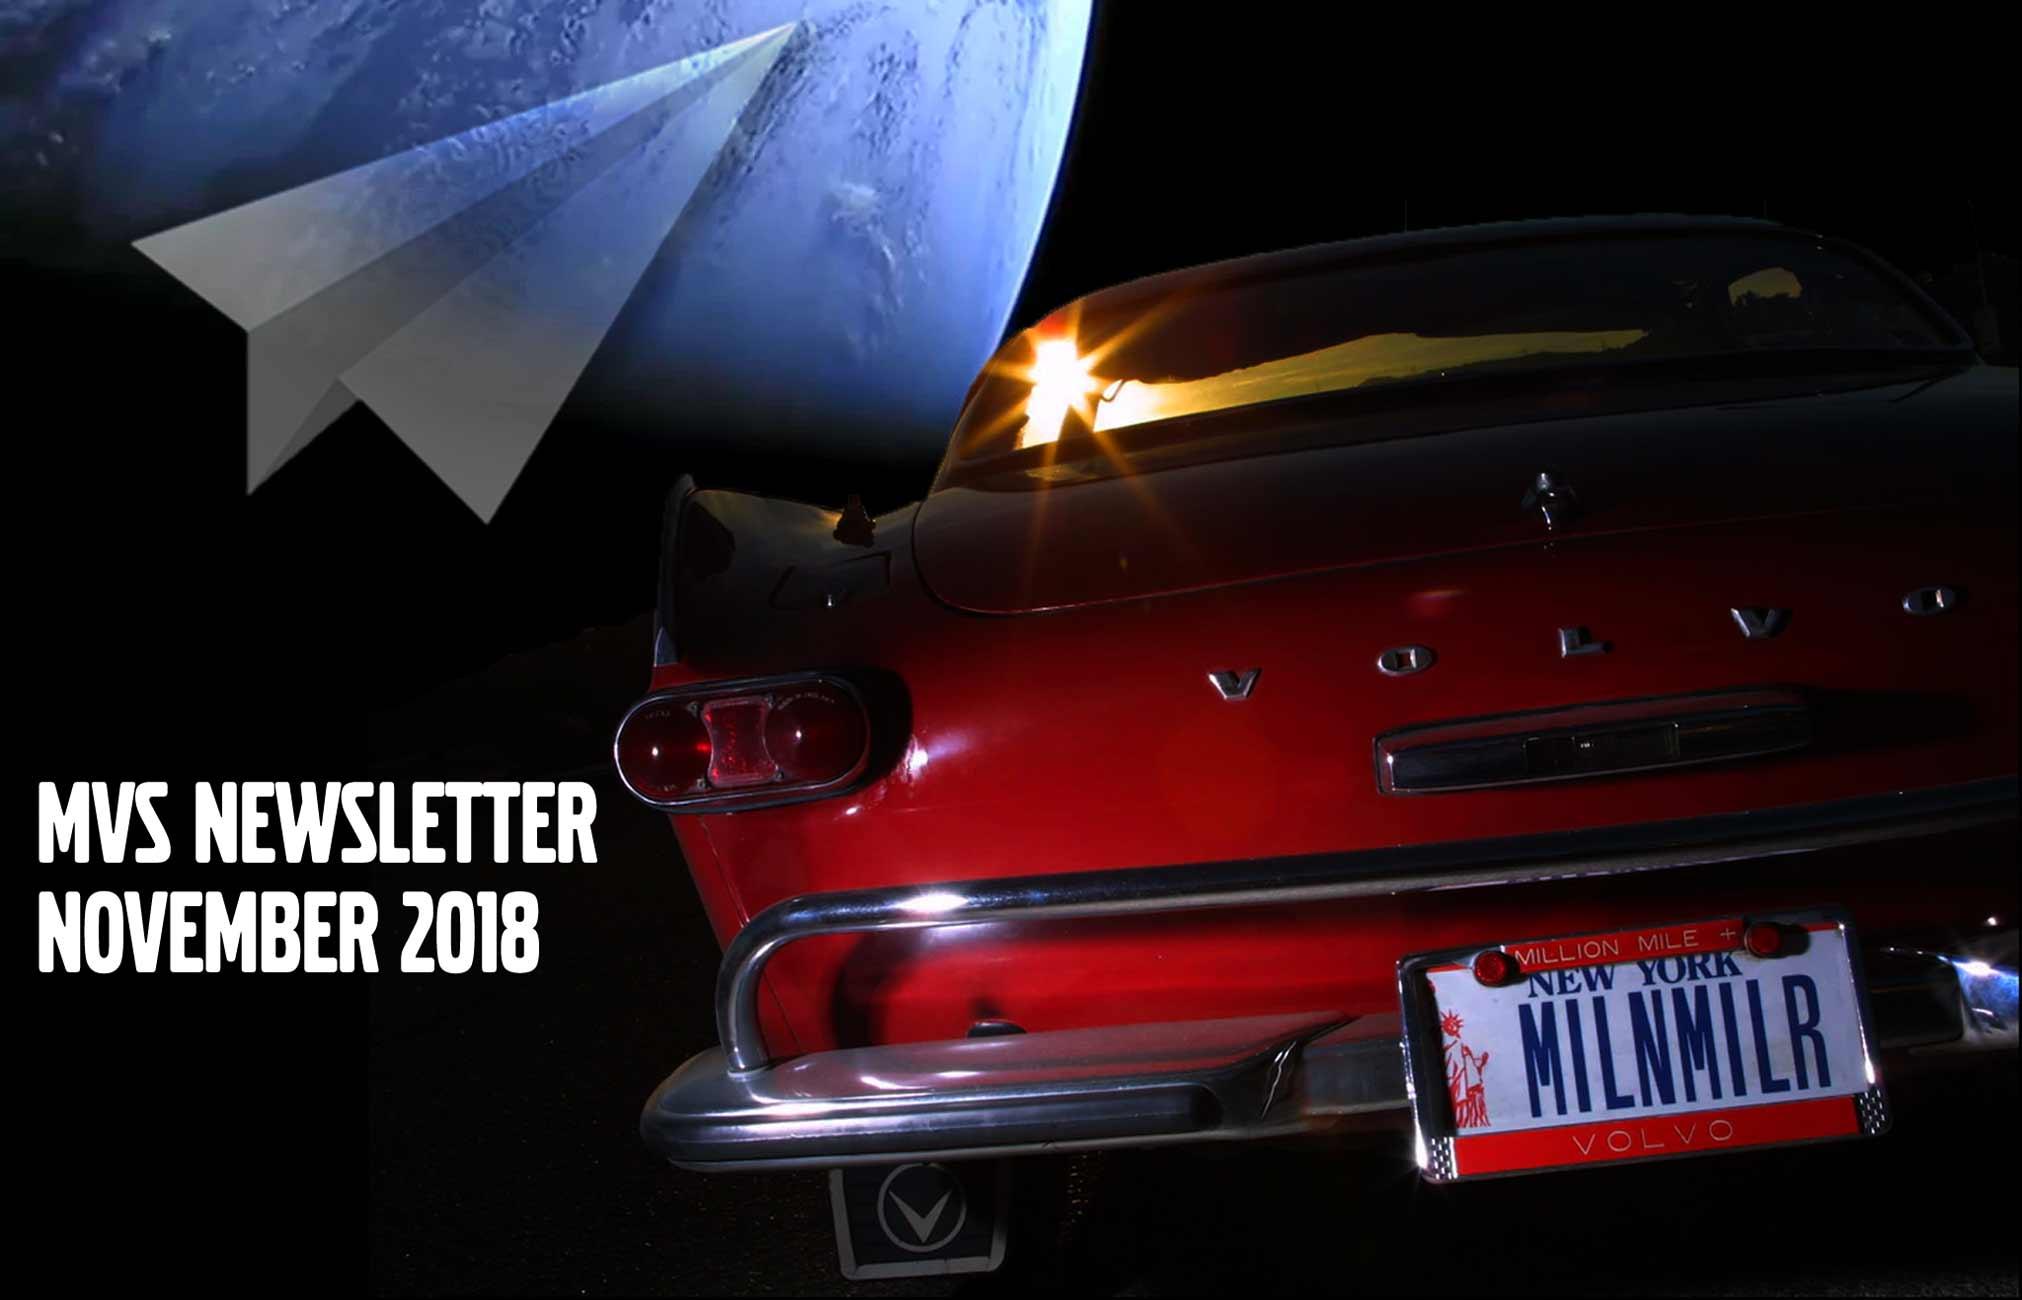 Mvs Newsletter Nov 2018 -